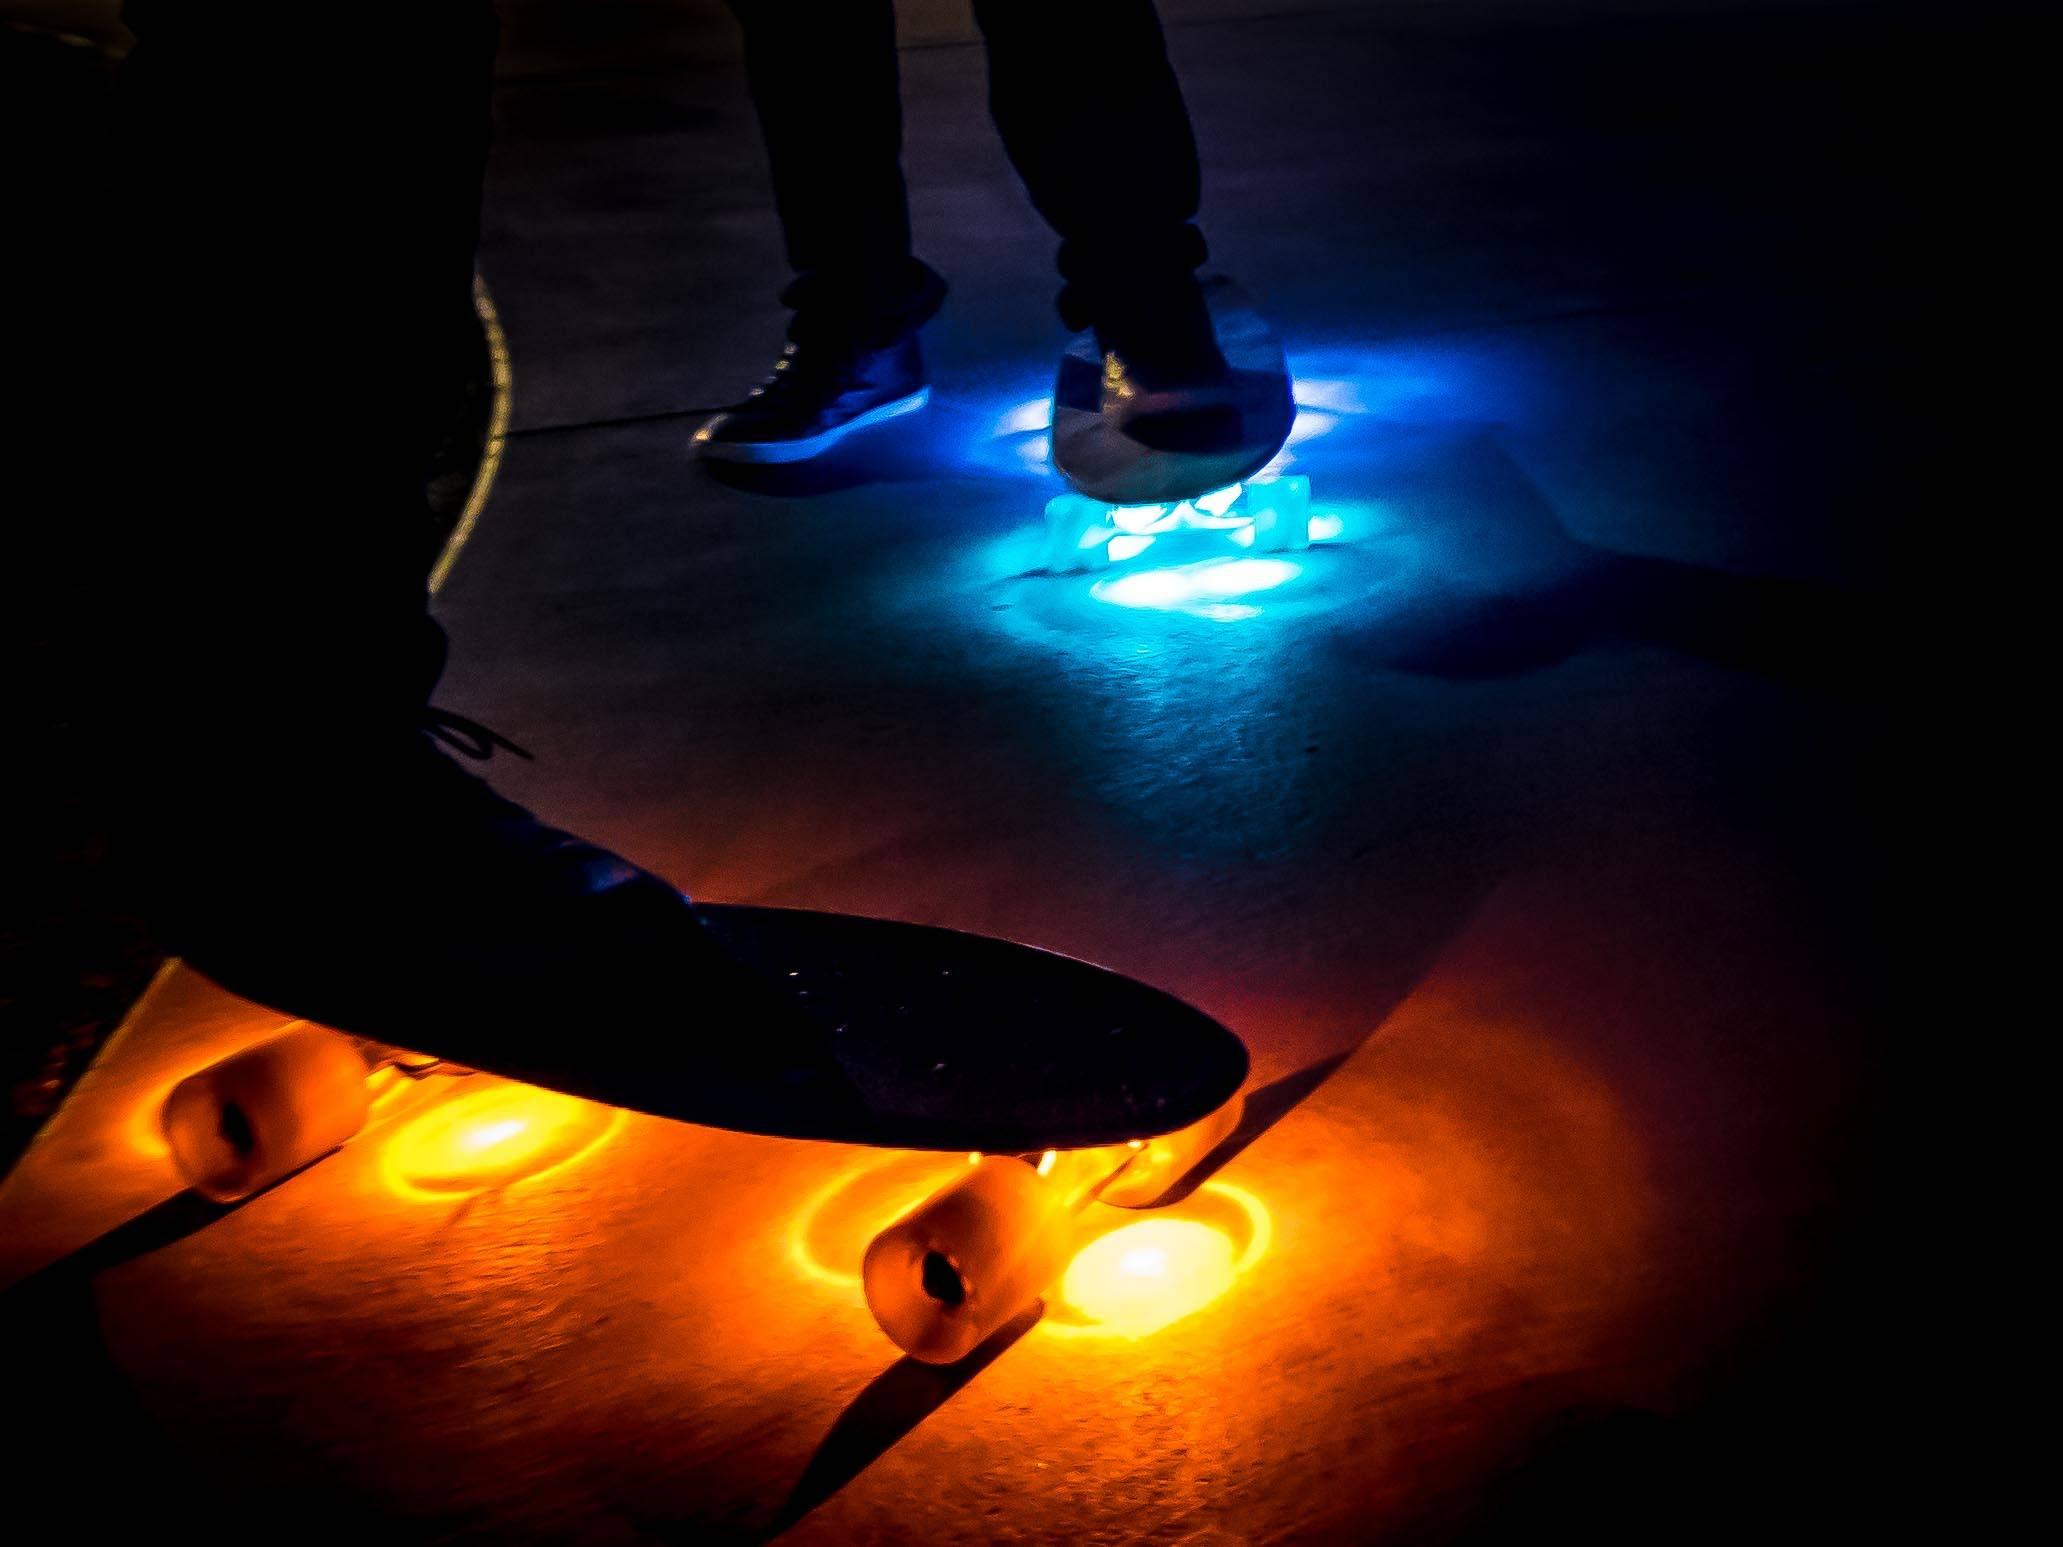 skateboard underglow lights at dark